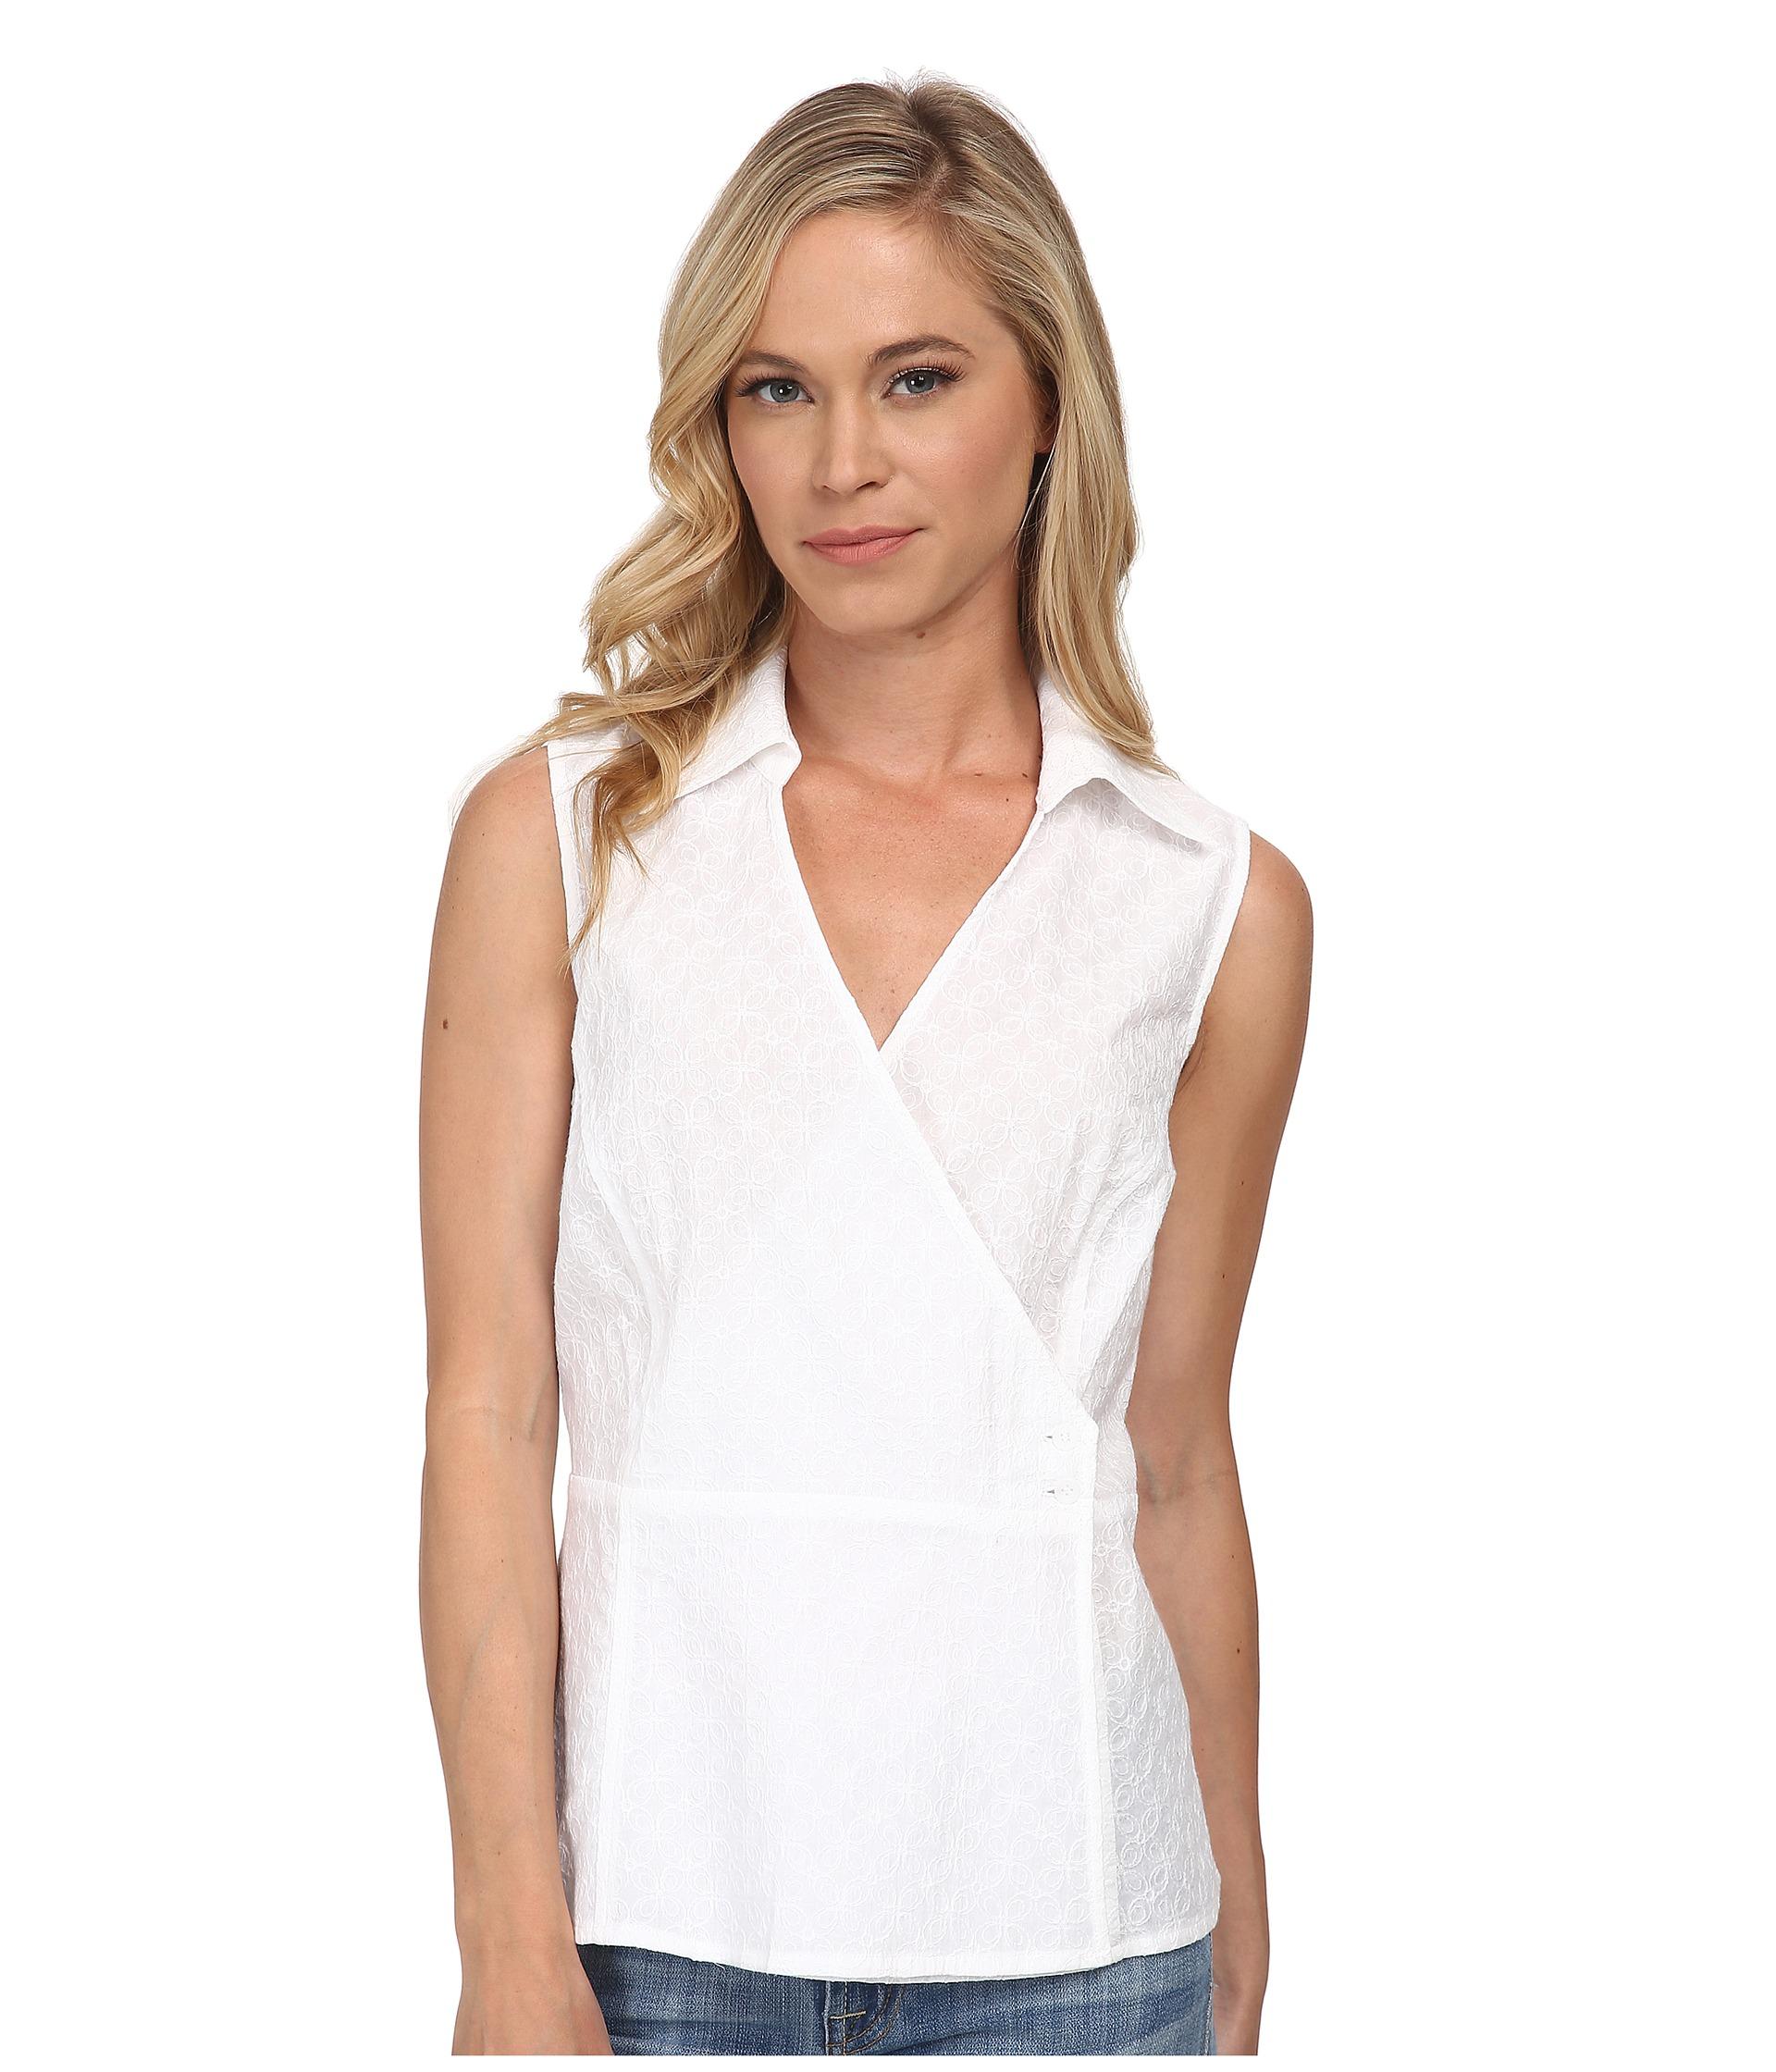 cab6e92f59e1 Pendleton Petite Sleeveless Wrap Shirt in White - Lyst